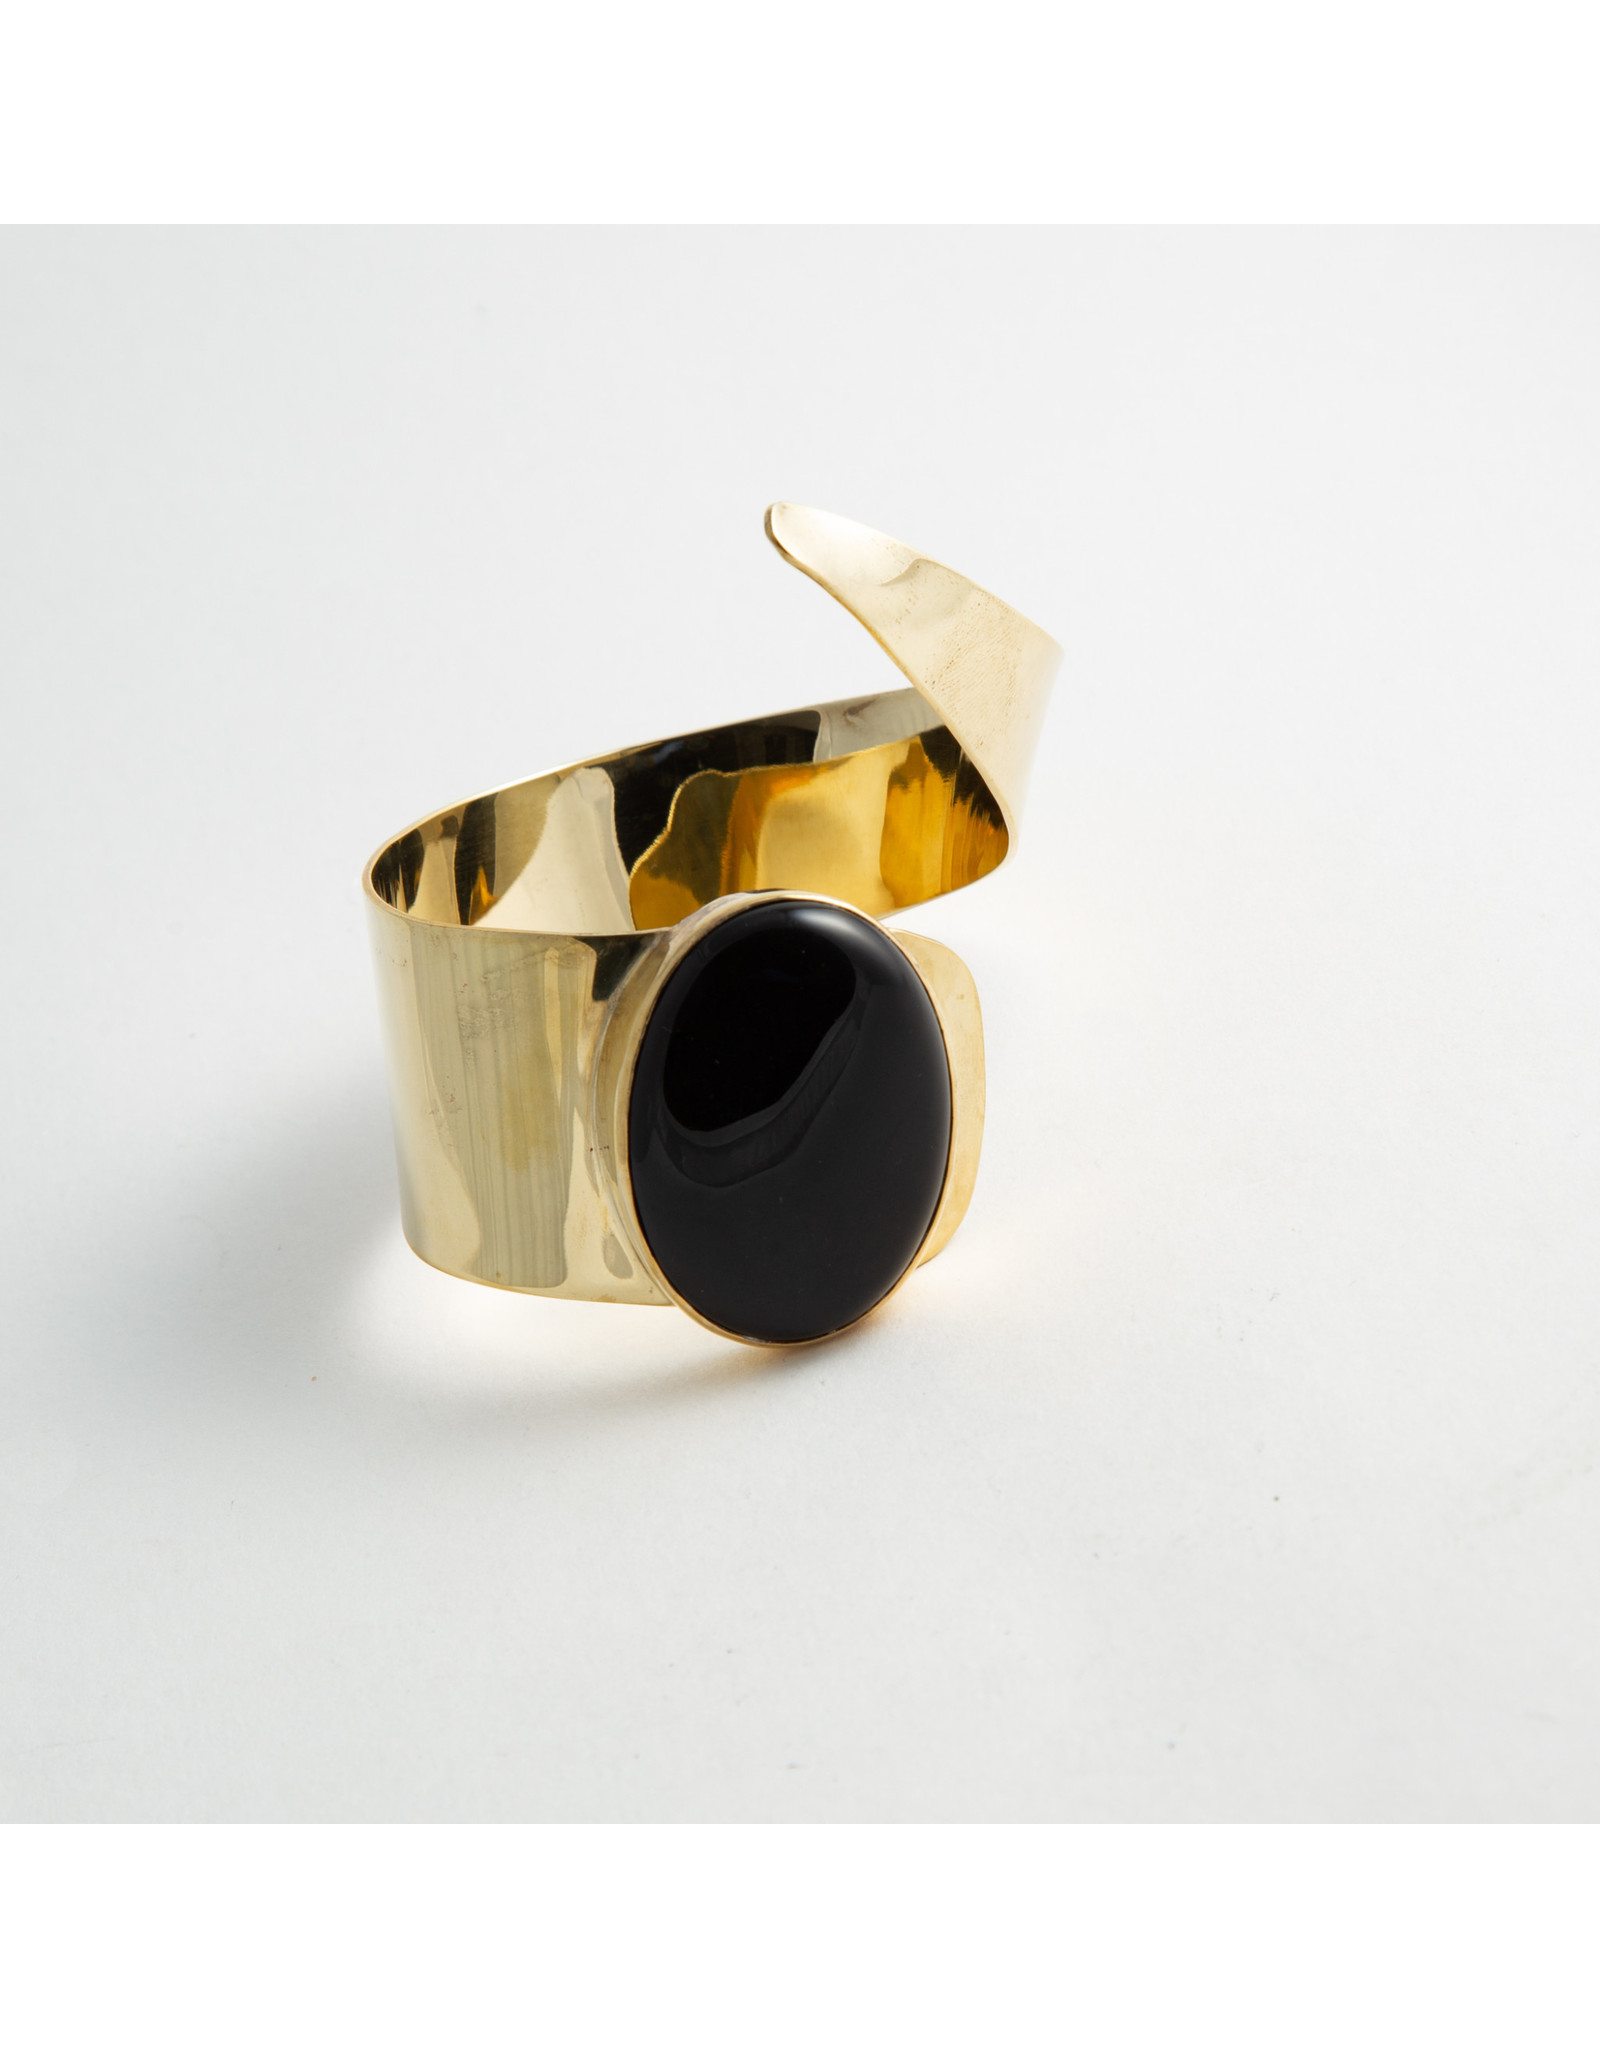 Buddha Jewelry Organics Buddha Jewelry Organics Brass & onyx cuff